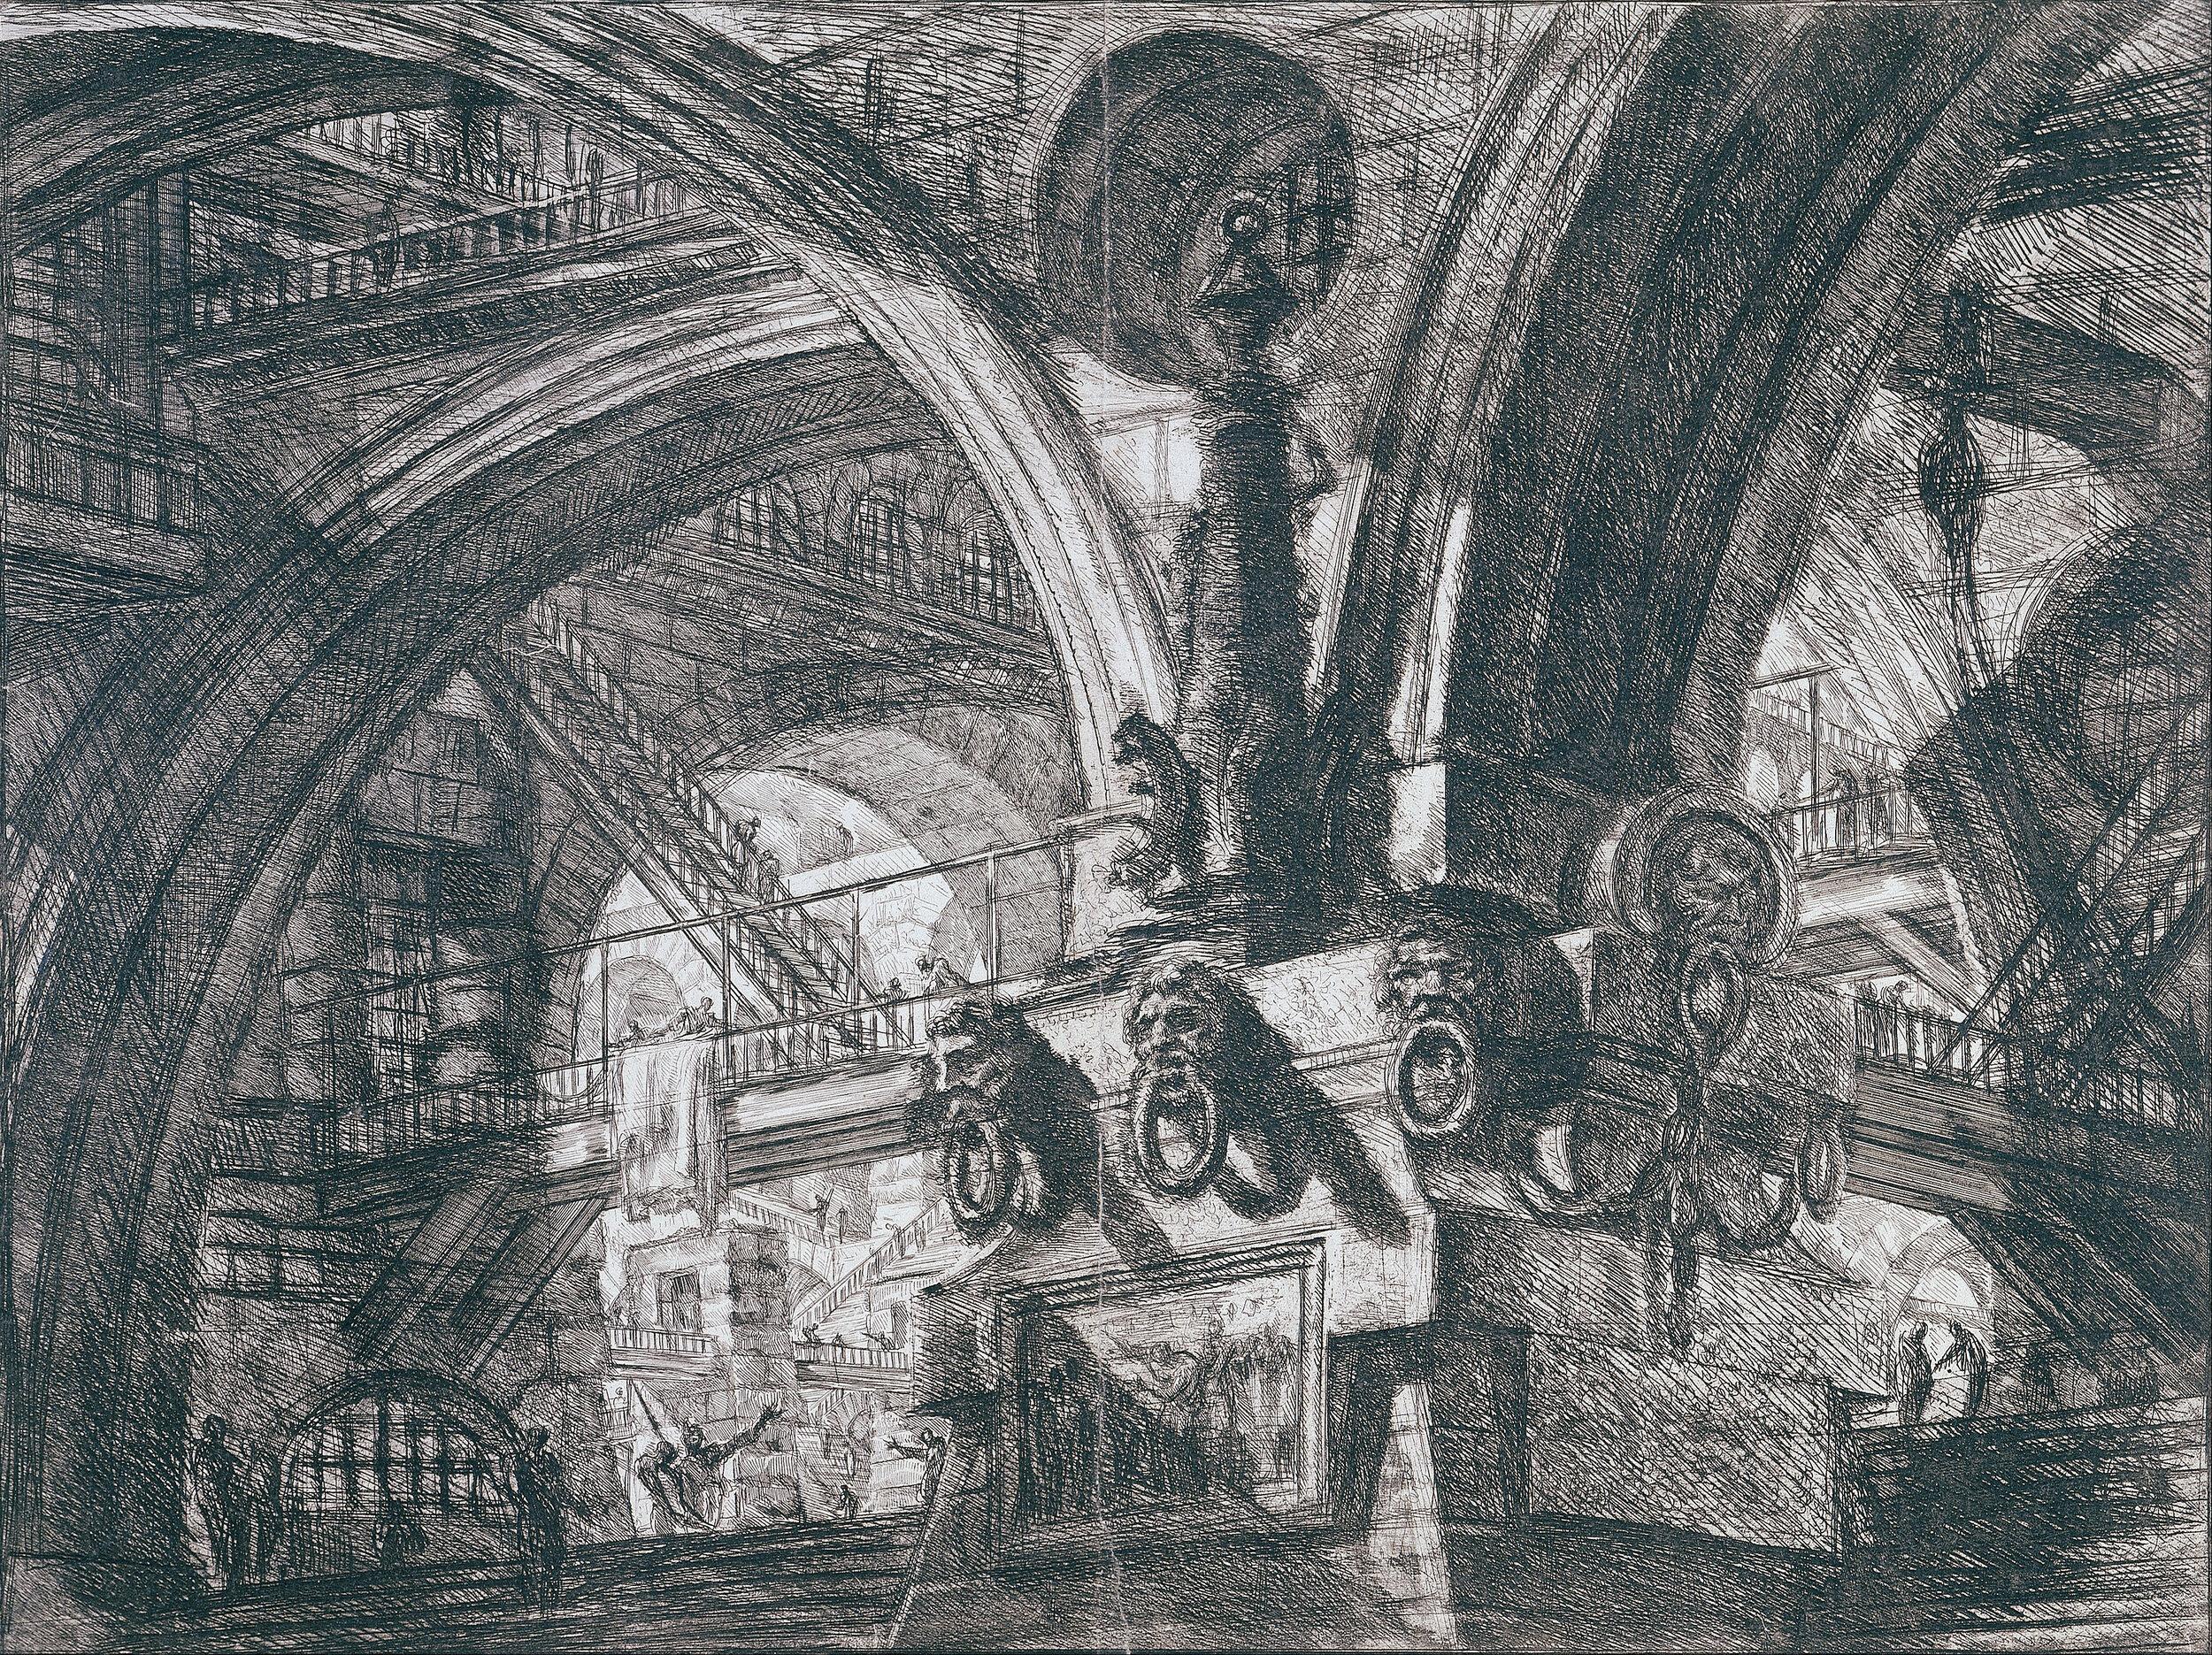 Giovanni_Battista_Piranesi_-_Prison_-_Google_Art_Project.jpg